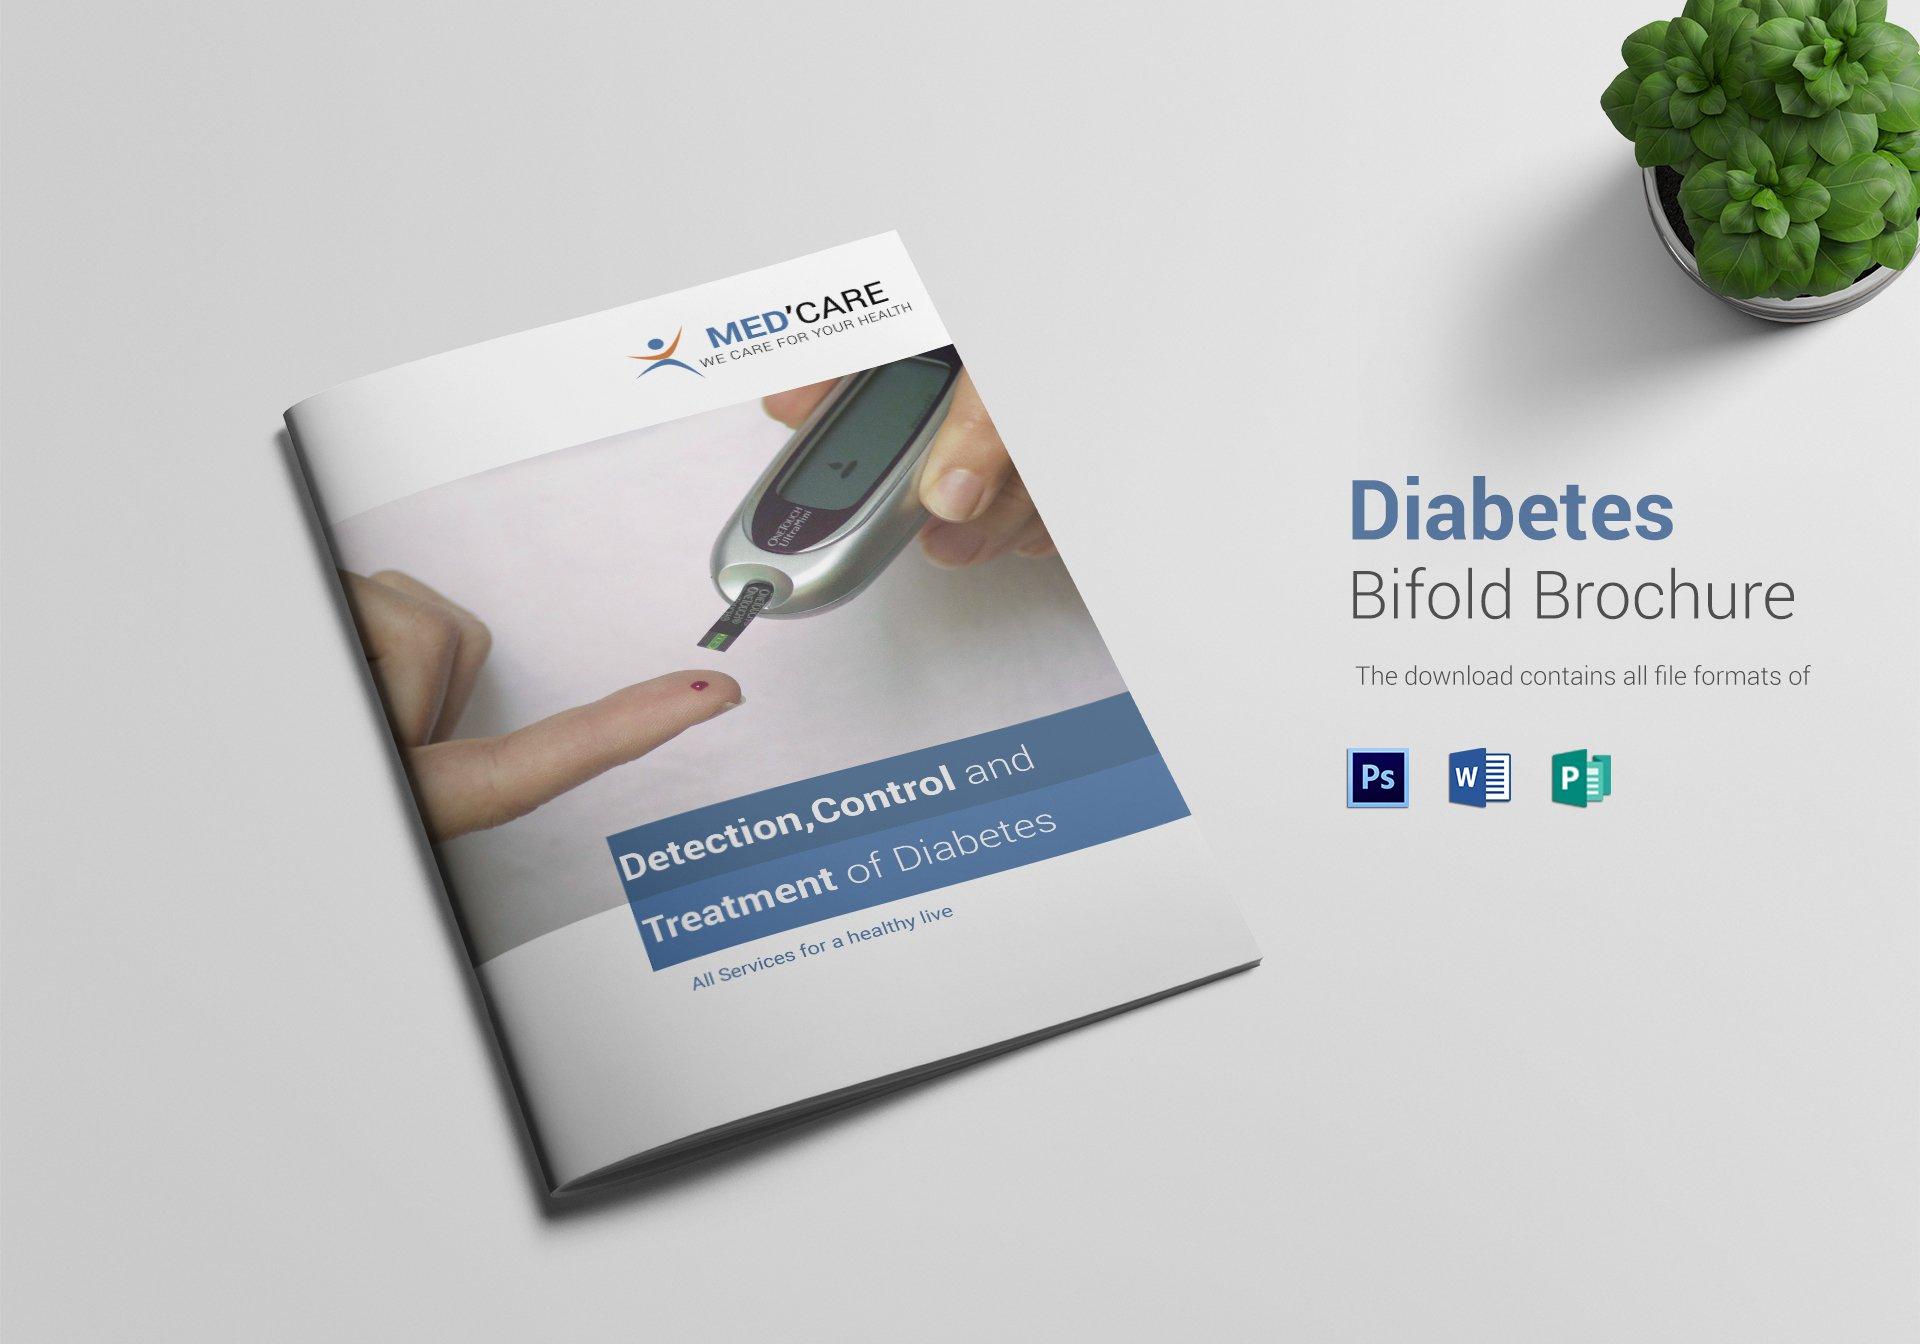 medcare diabetes bifold brochure template